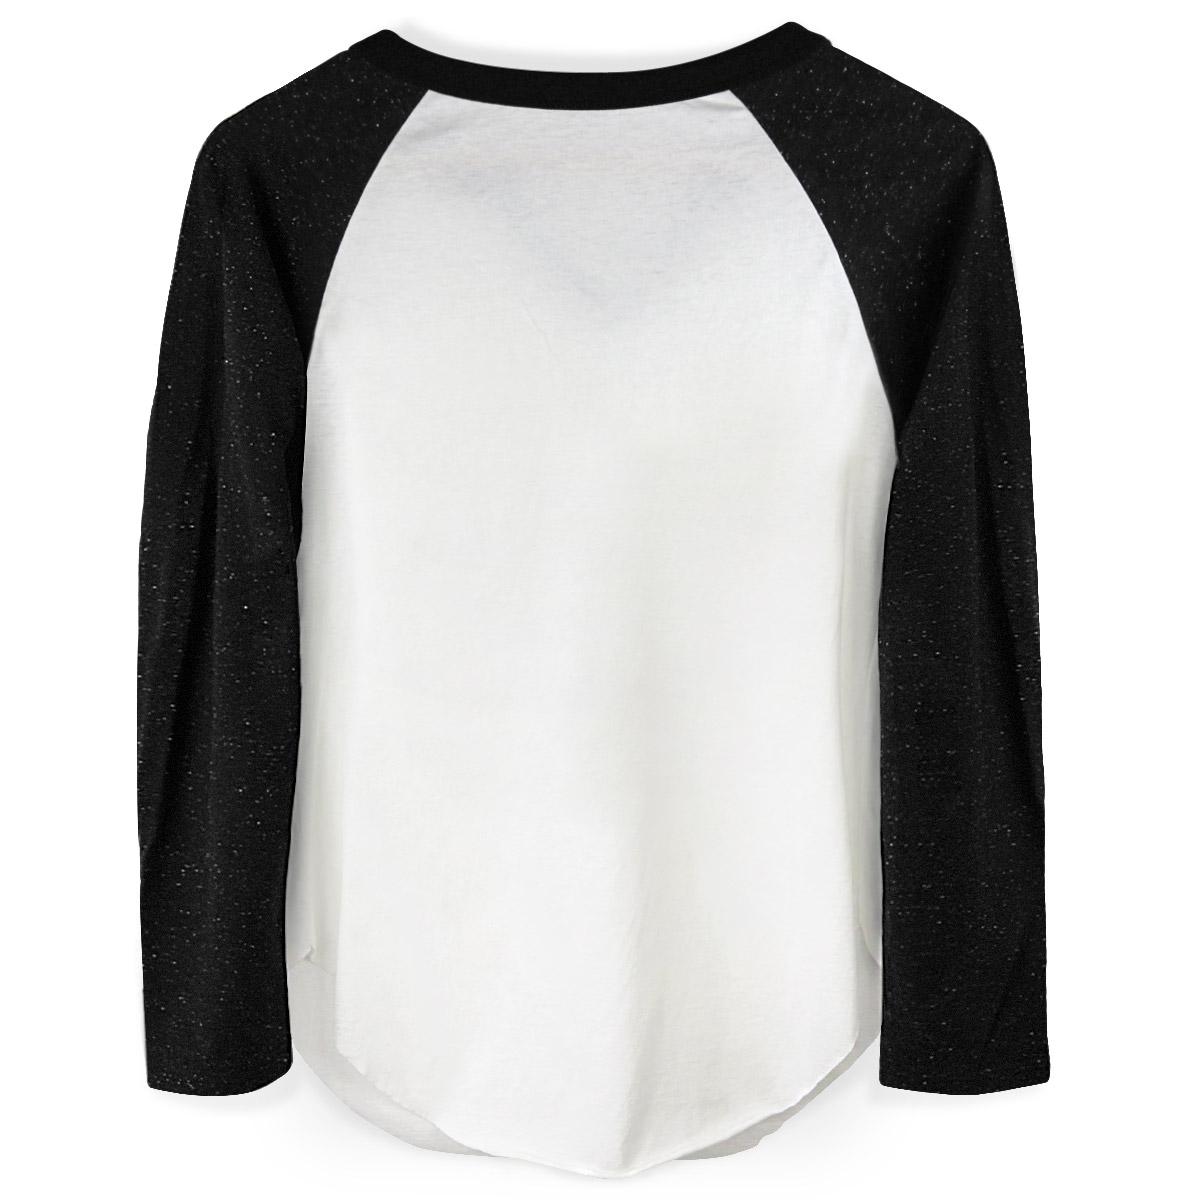 Camiseta Manga Longa Feminina Fresno Capa Ciano